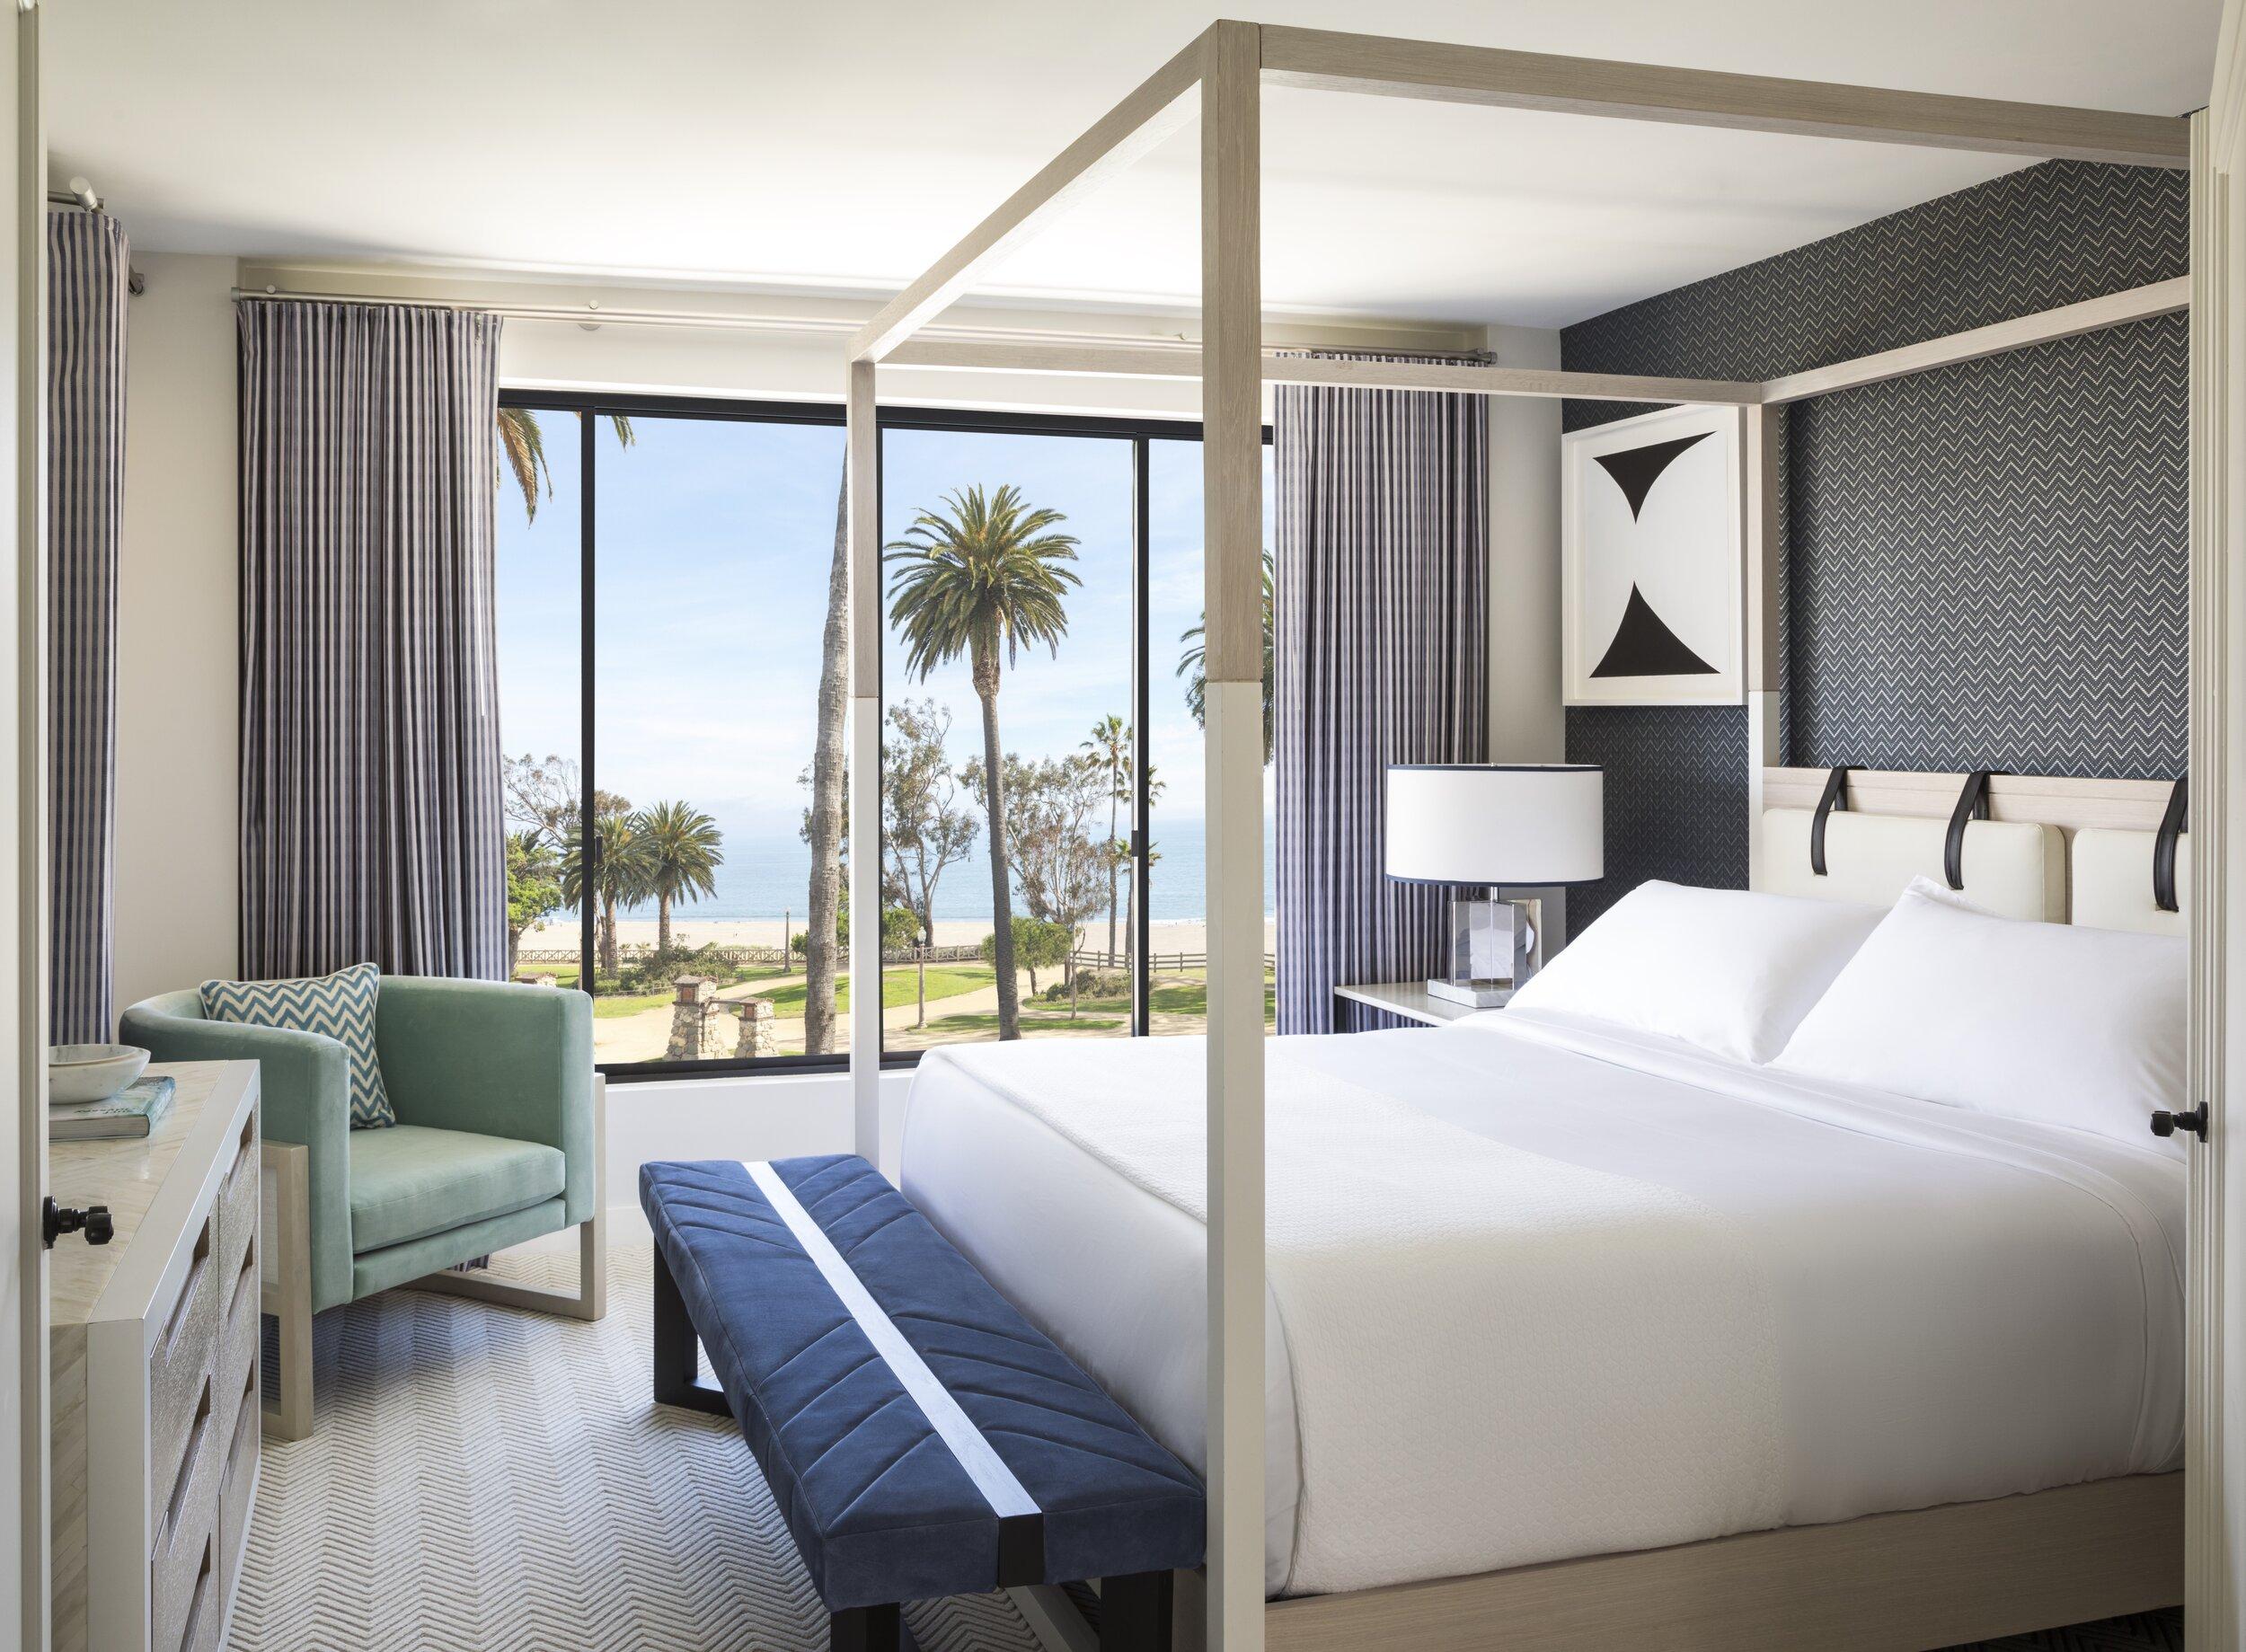 Oceana Is La S Hottest New Hotel Combining 5 Star Luxury With Coastal Cool Malibu Magazine